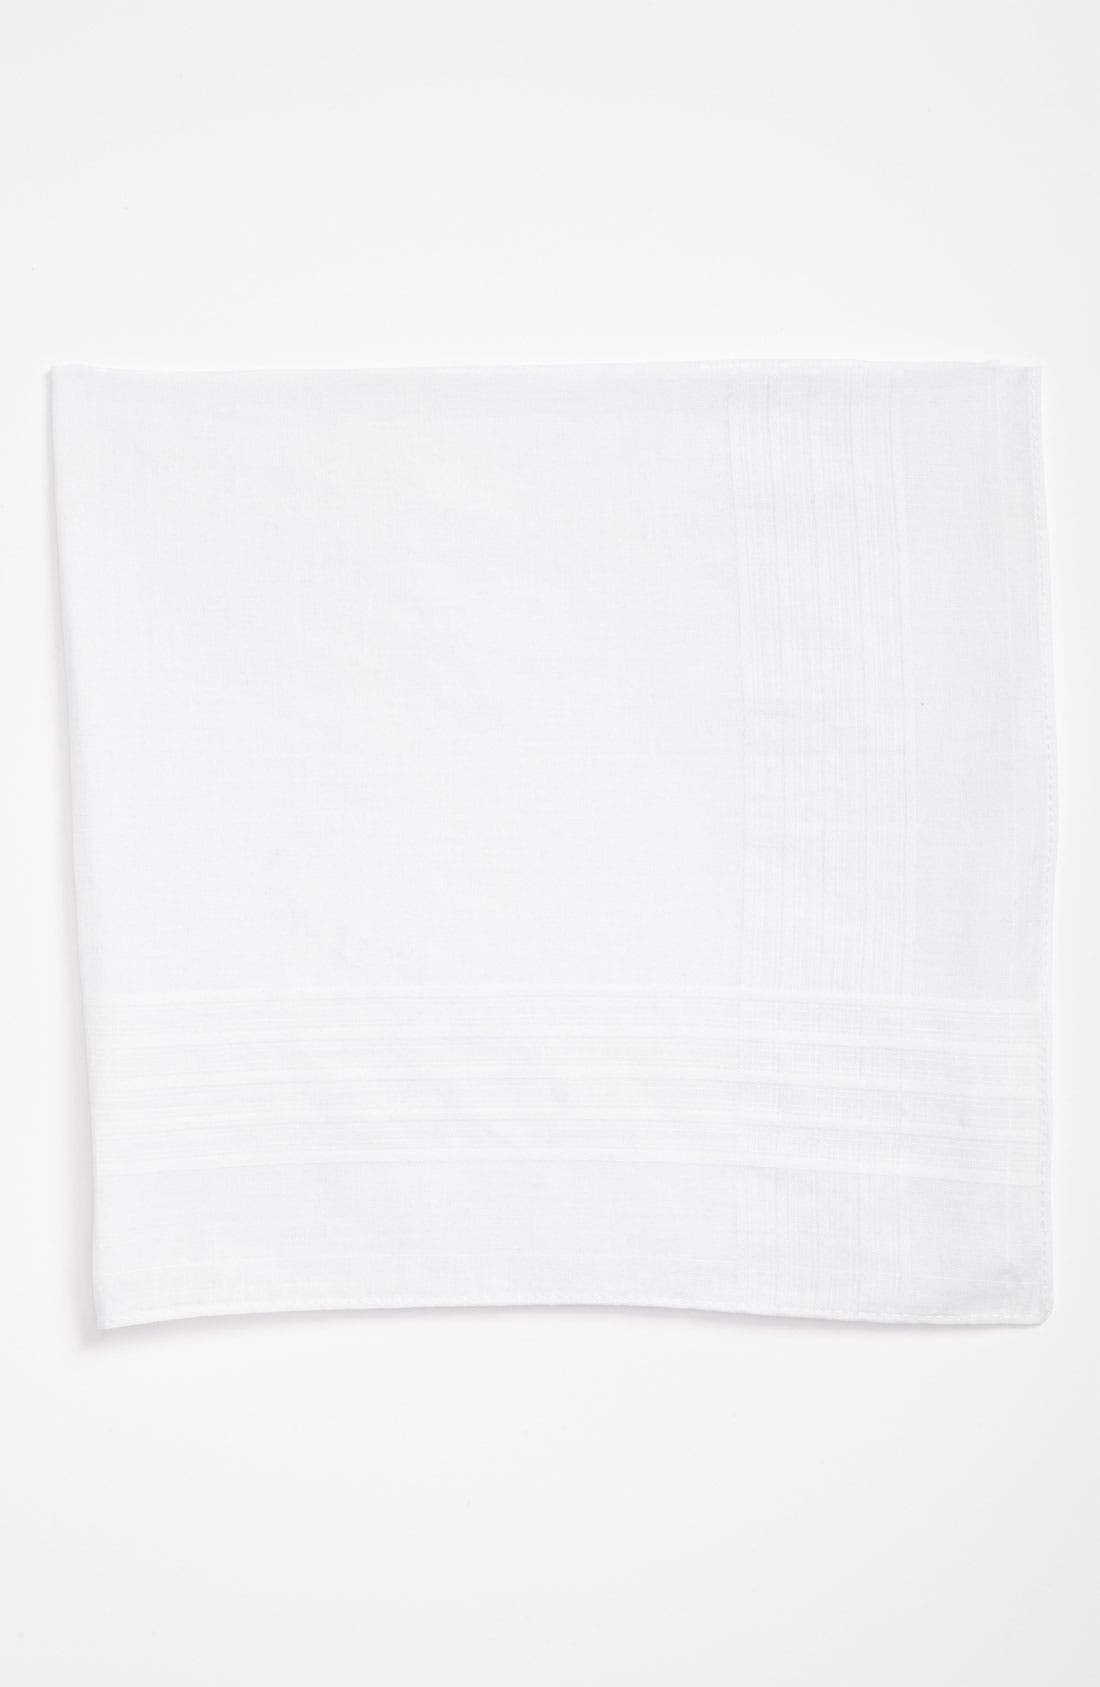 Alternate Image 1 Selected - Nordstrom Men's Shop Cotton Handkerchief (7-Pack)